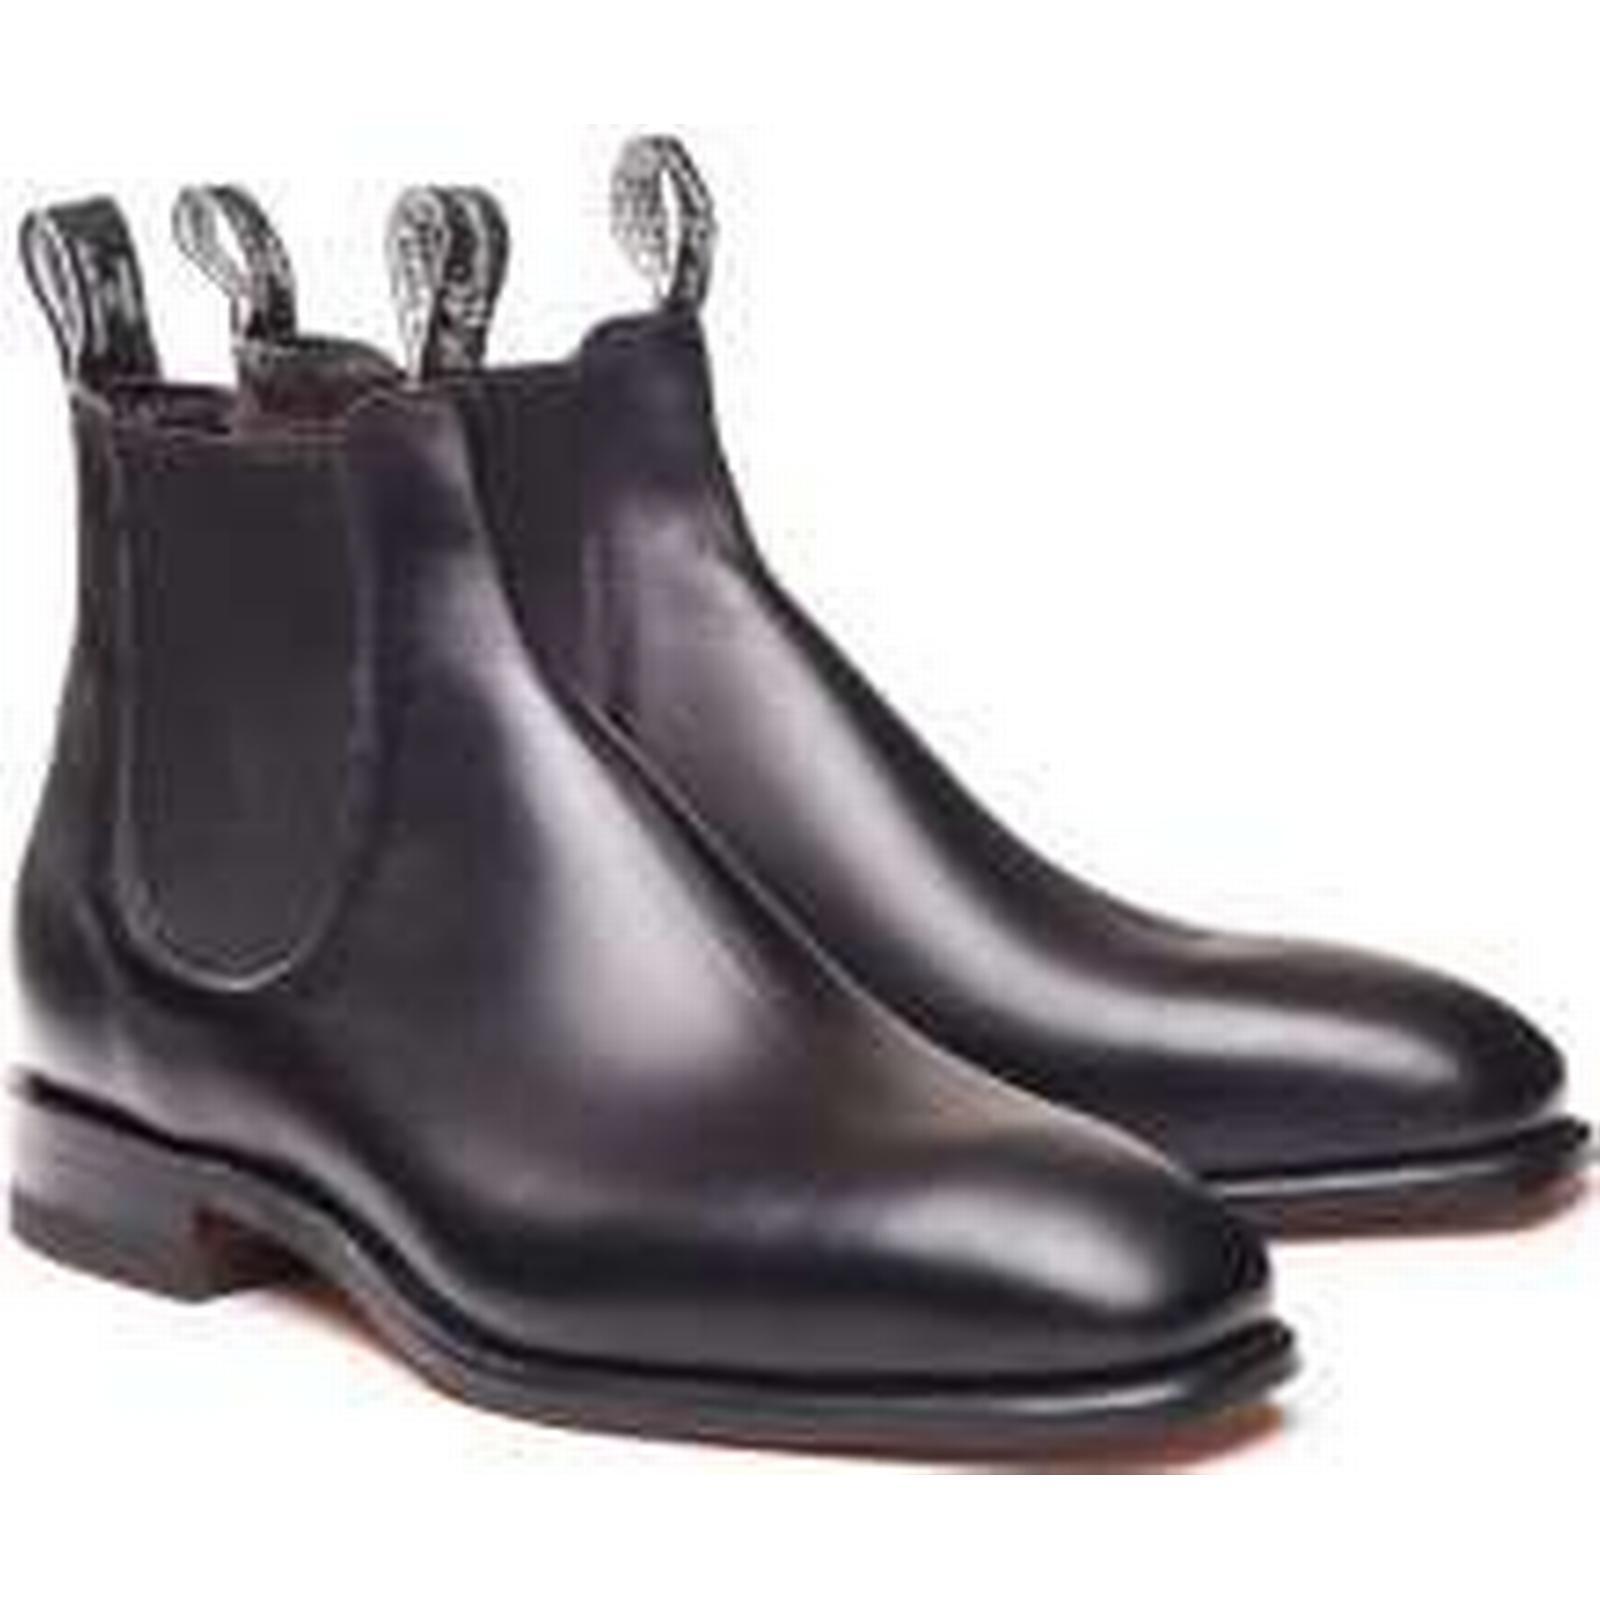 R.M. Williams Comfort Craftsman Fit, Boots, Black Wide H Fit, Craftsman UK9 d22d10